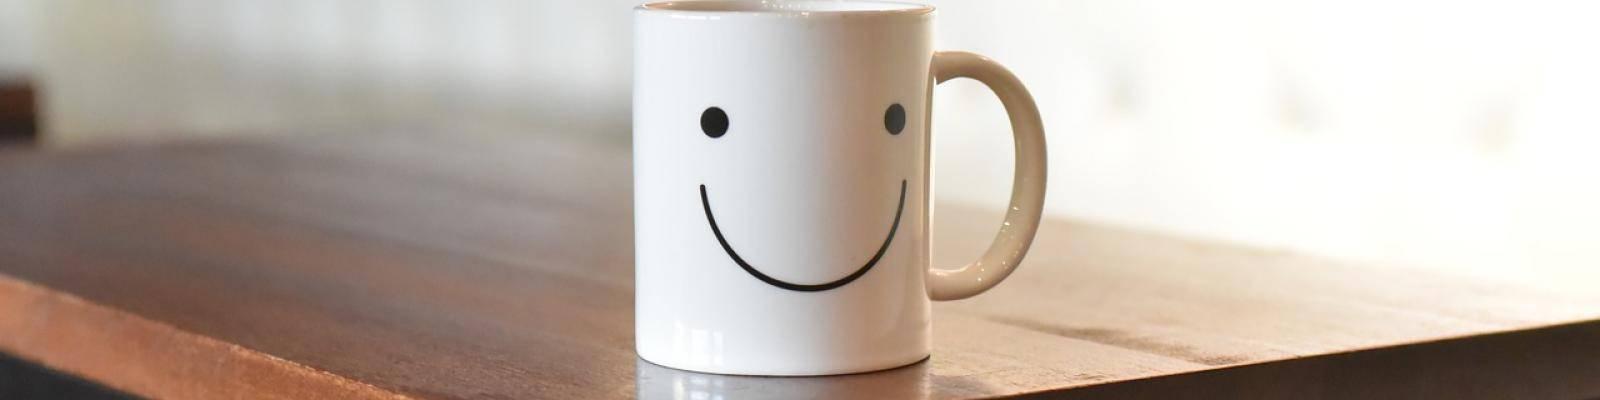 Mok met blije smiley